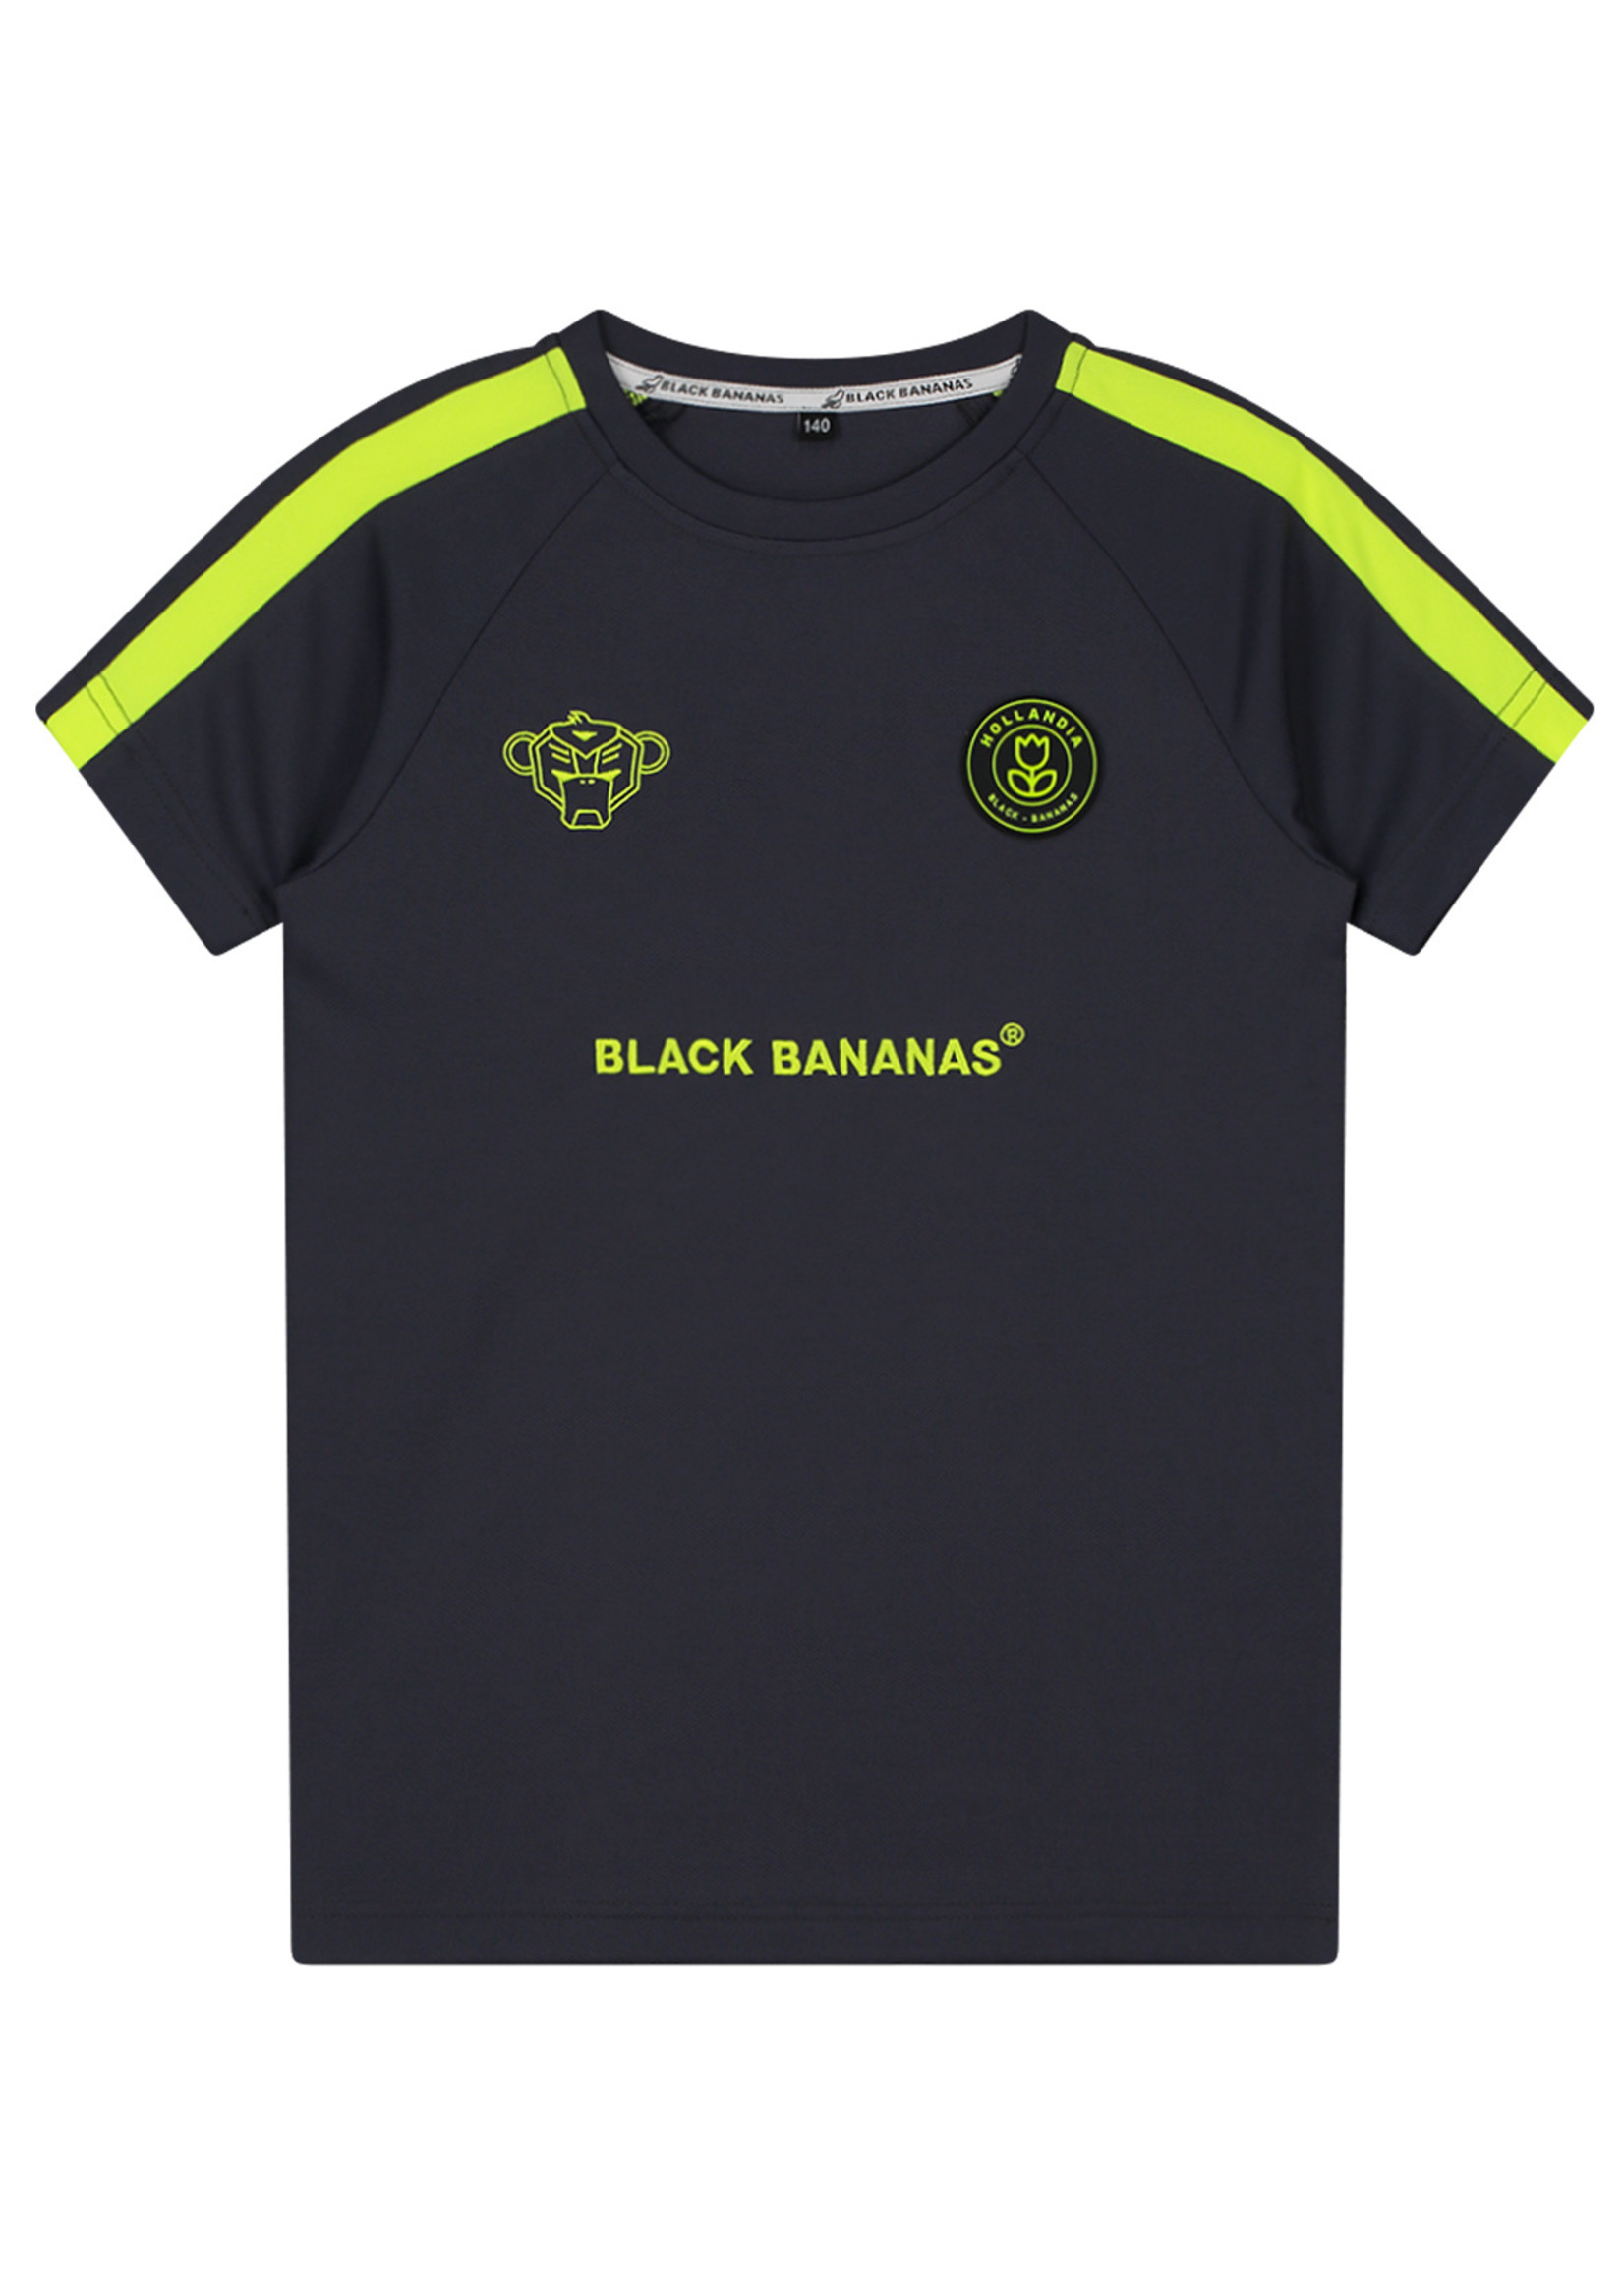 Black Bananas BlackBananas F.C. Match Tee grey